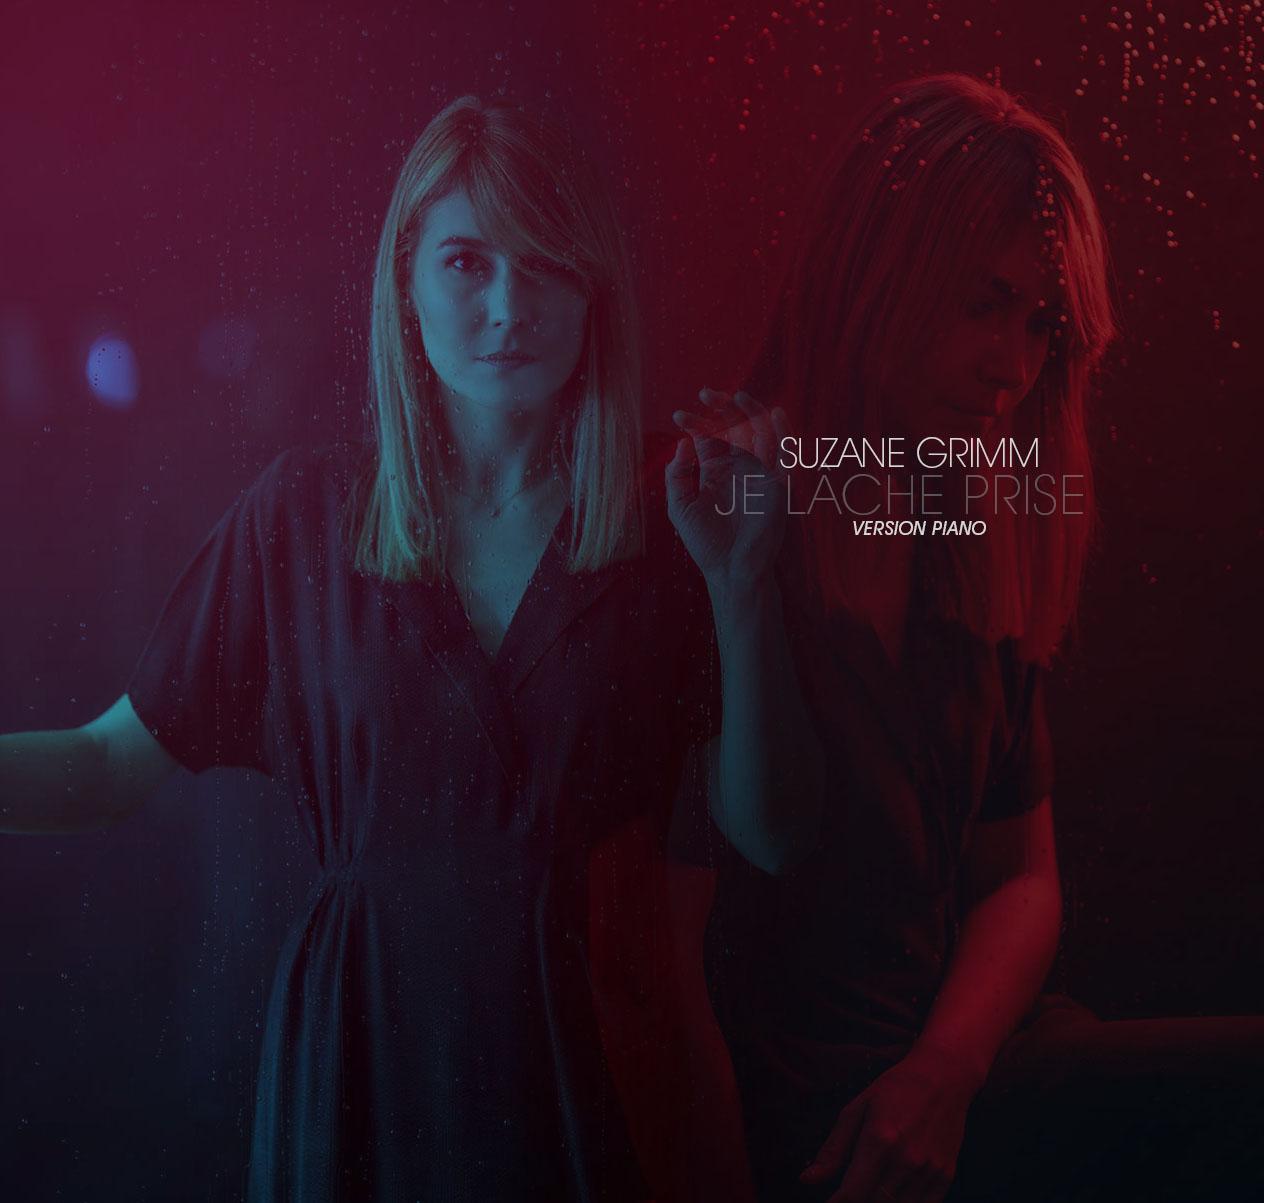 suzane-grimm-Laurent-Scavone